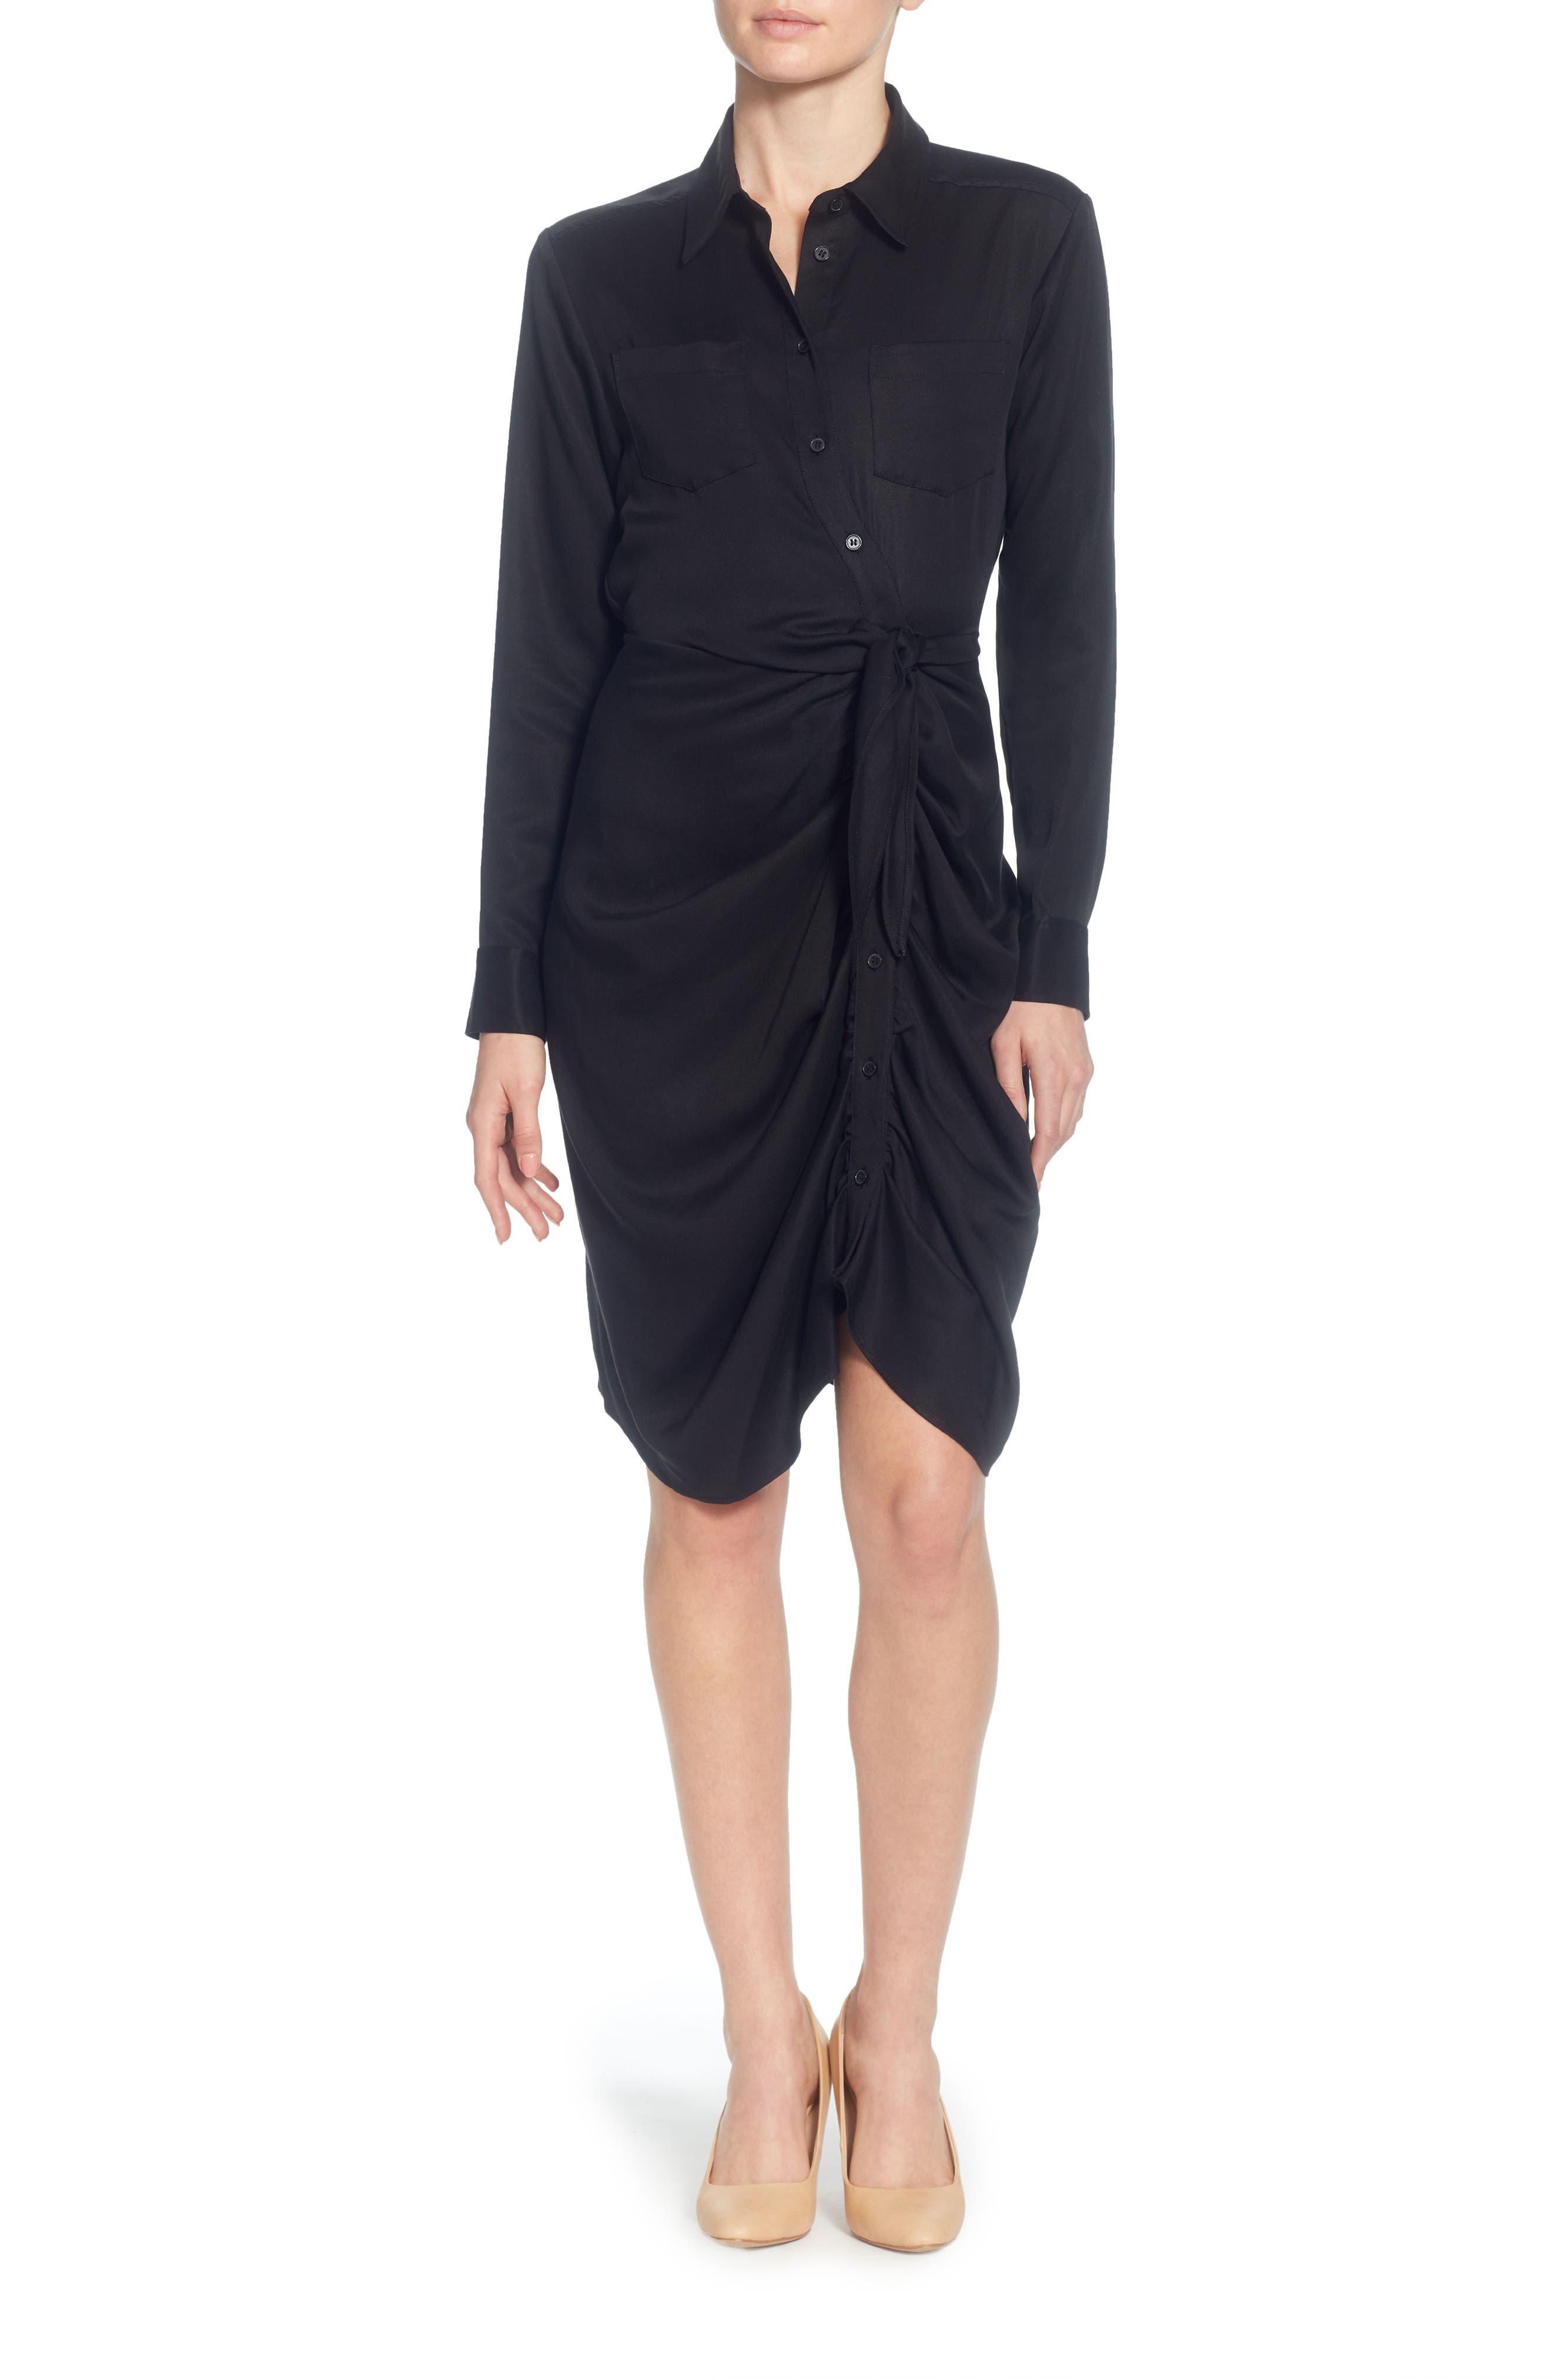 Sloan Tie-Waist Dress,                             Main thumbnail 1, color,                             001